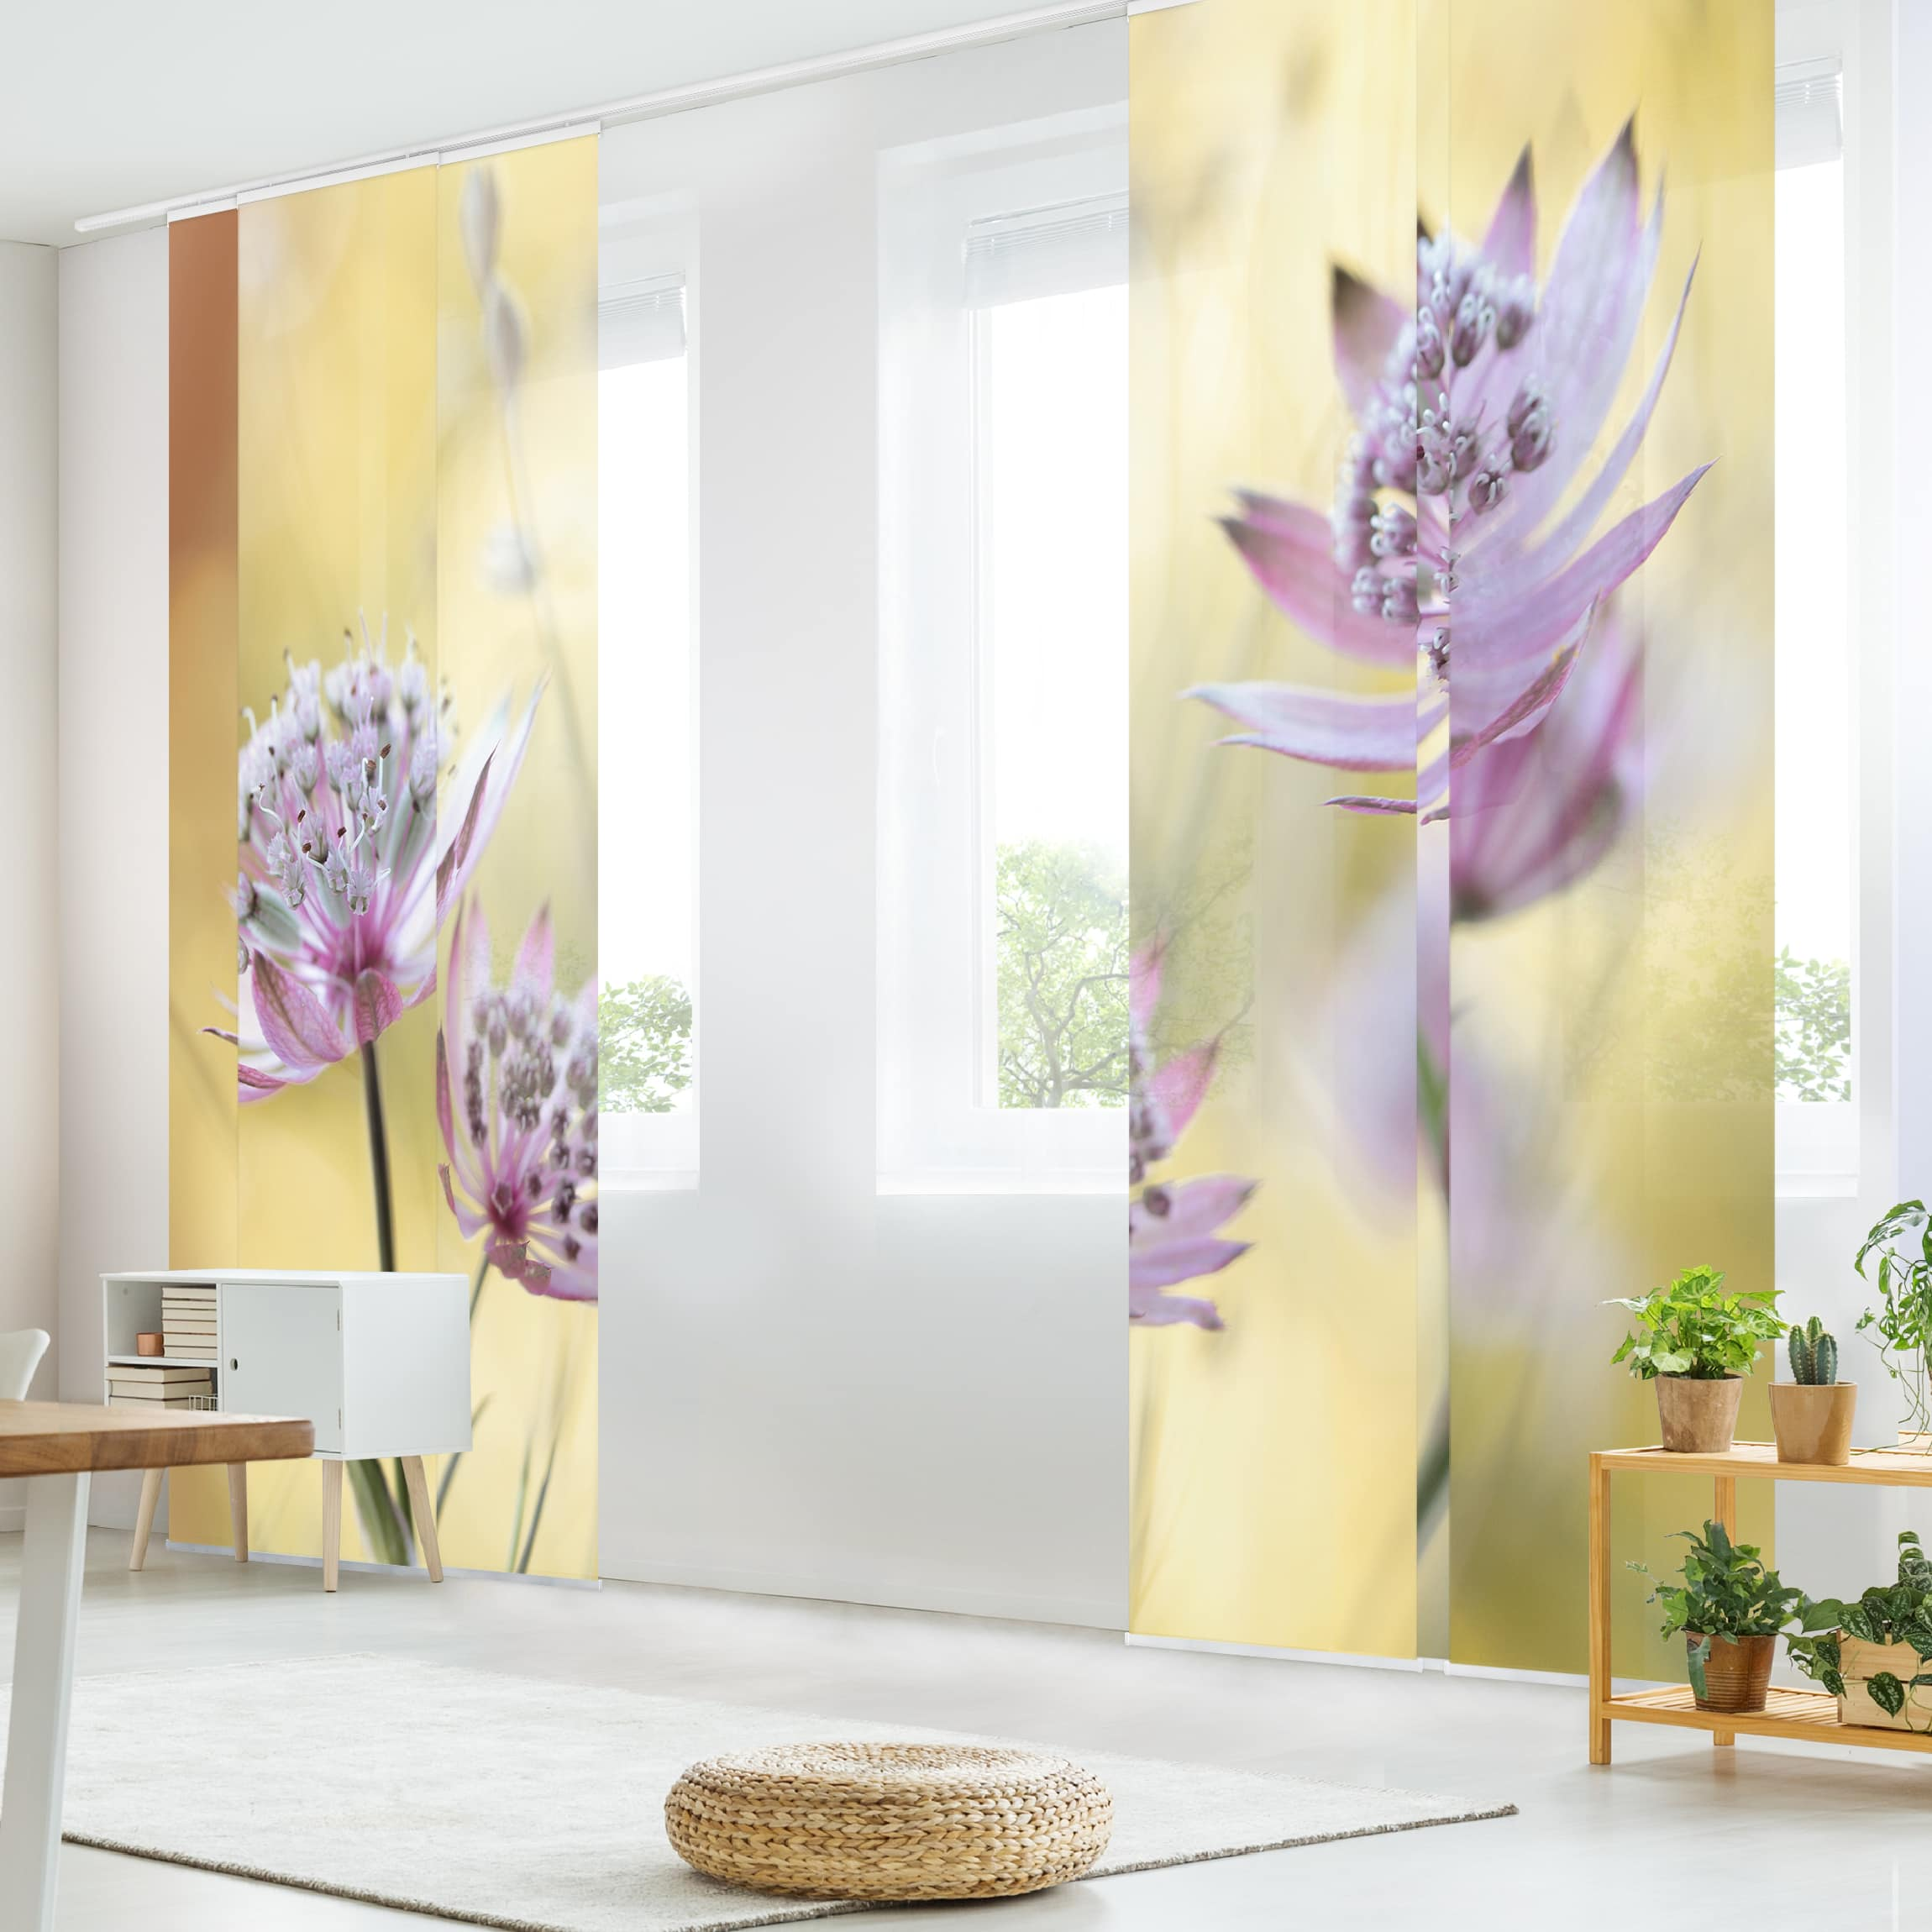 schiebegardinen set astrantia major 6 fl chenvorh nge. Black Bedroom Furniture Sets. Home Design Ideas